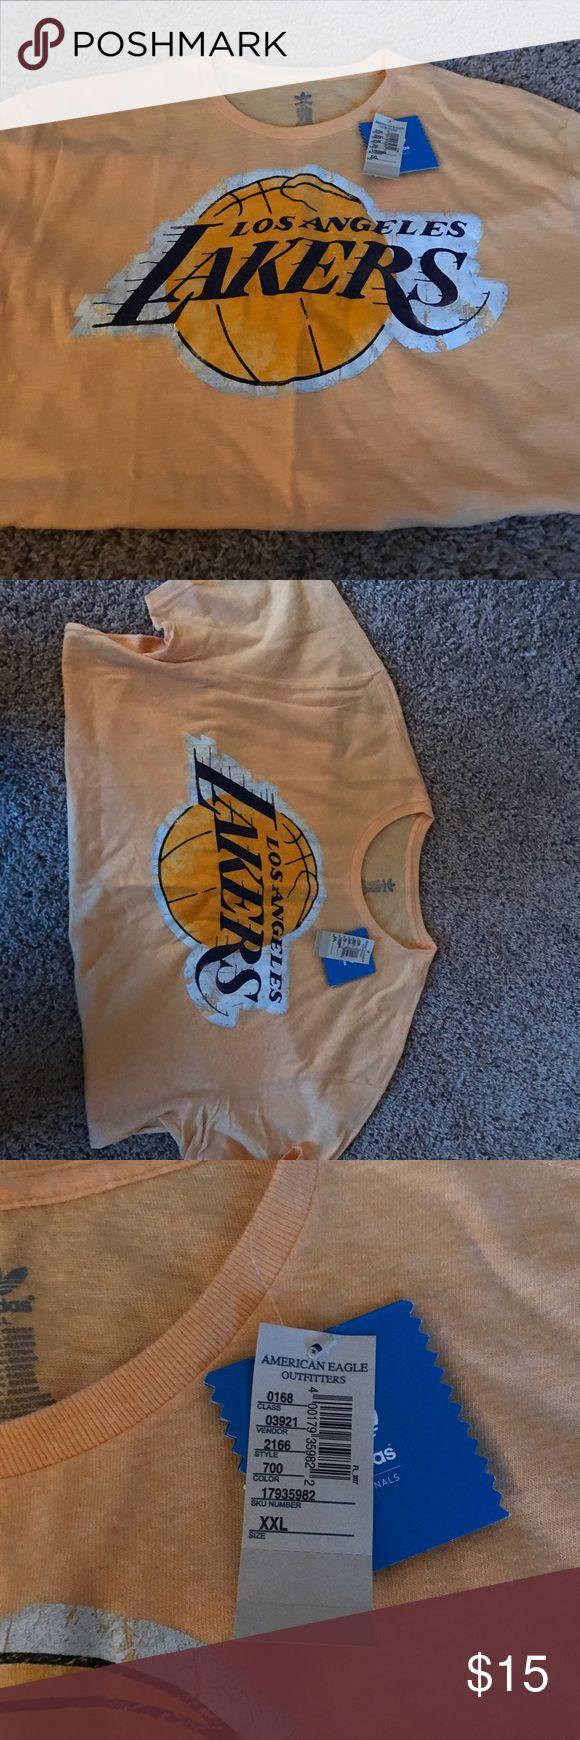 Los Angeles Lakers T shirt Adidas Los Angeles Lakers Shirt Adidas Shirts Tees - Short Sleeve